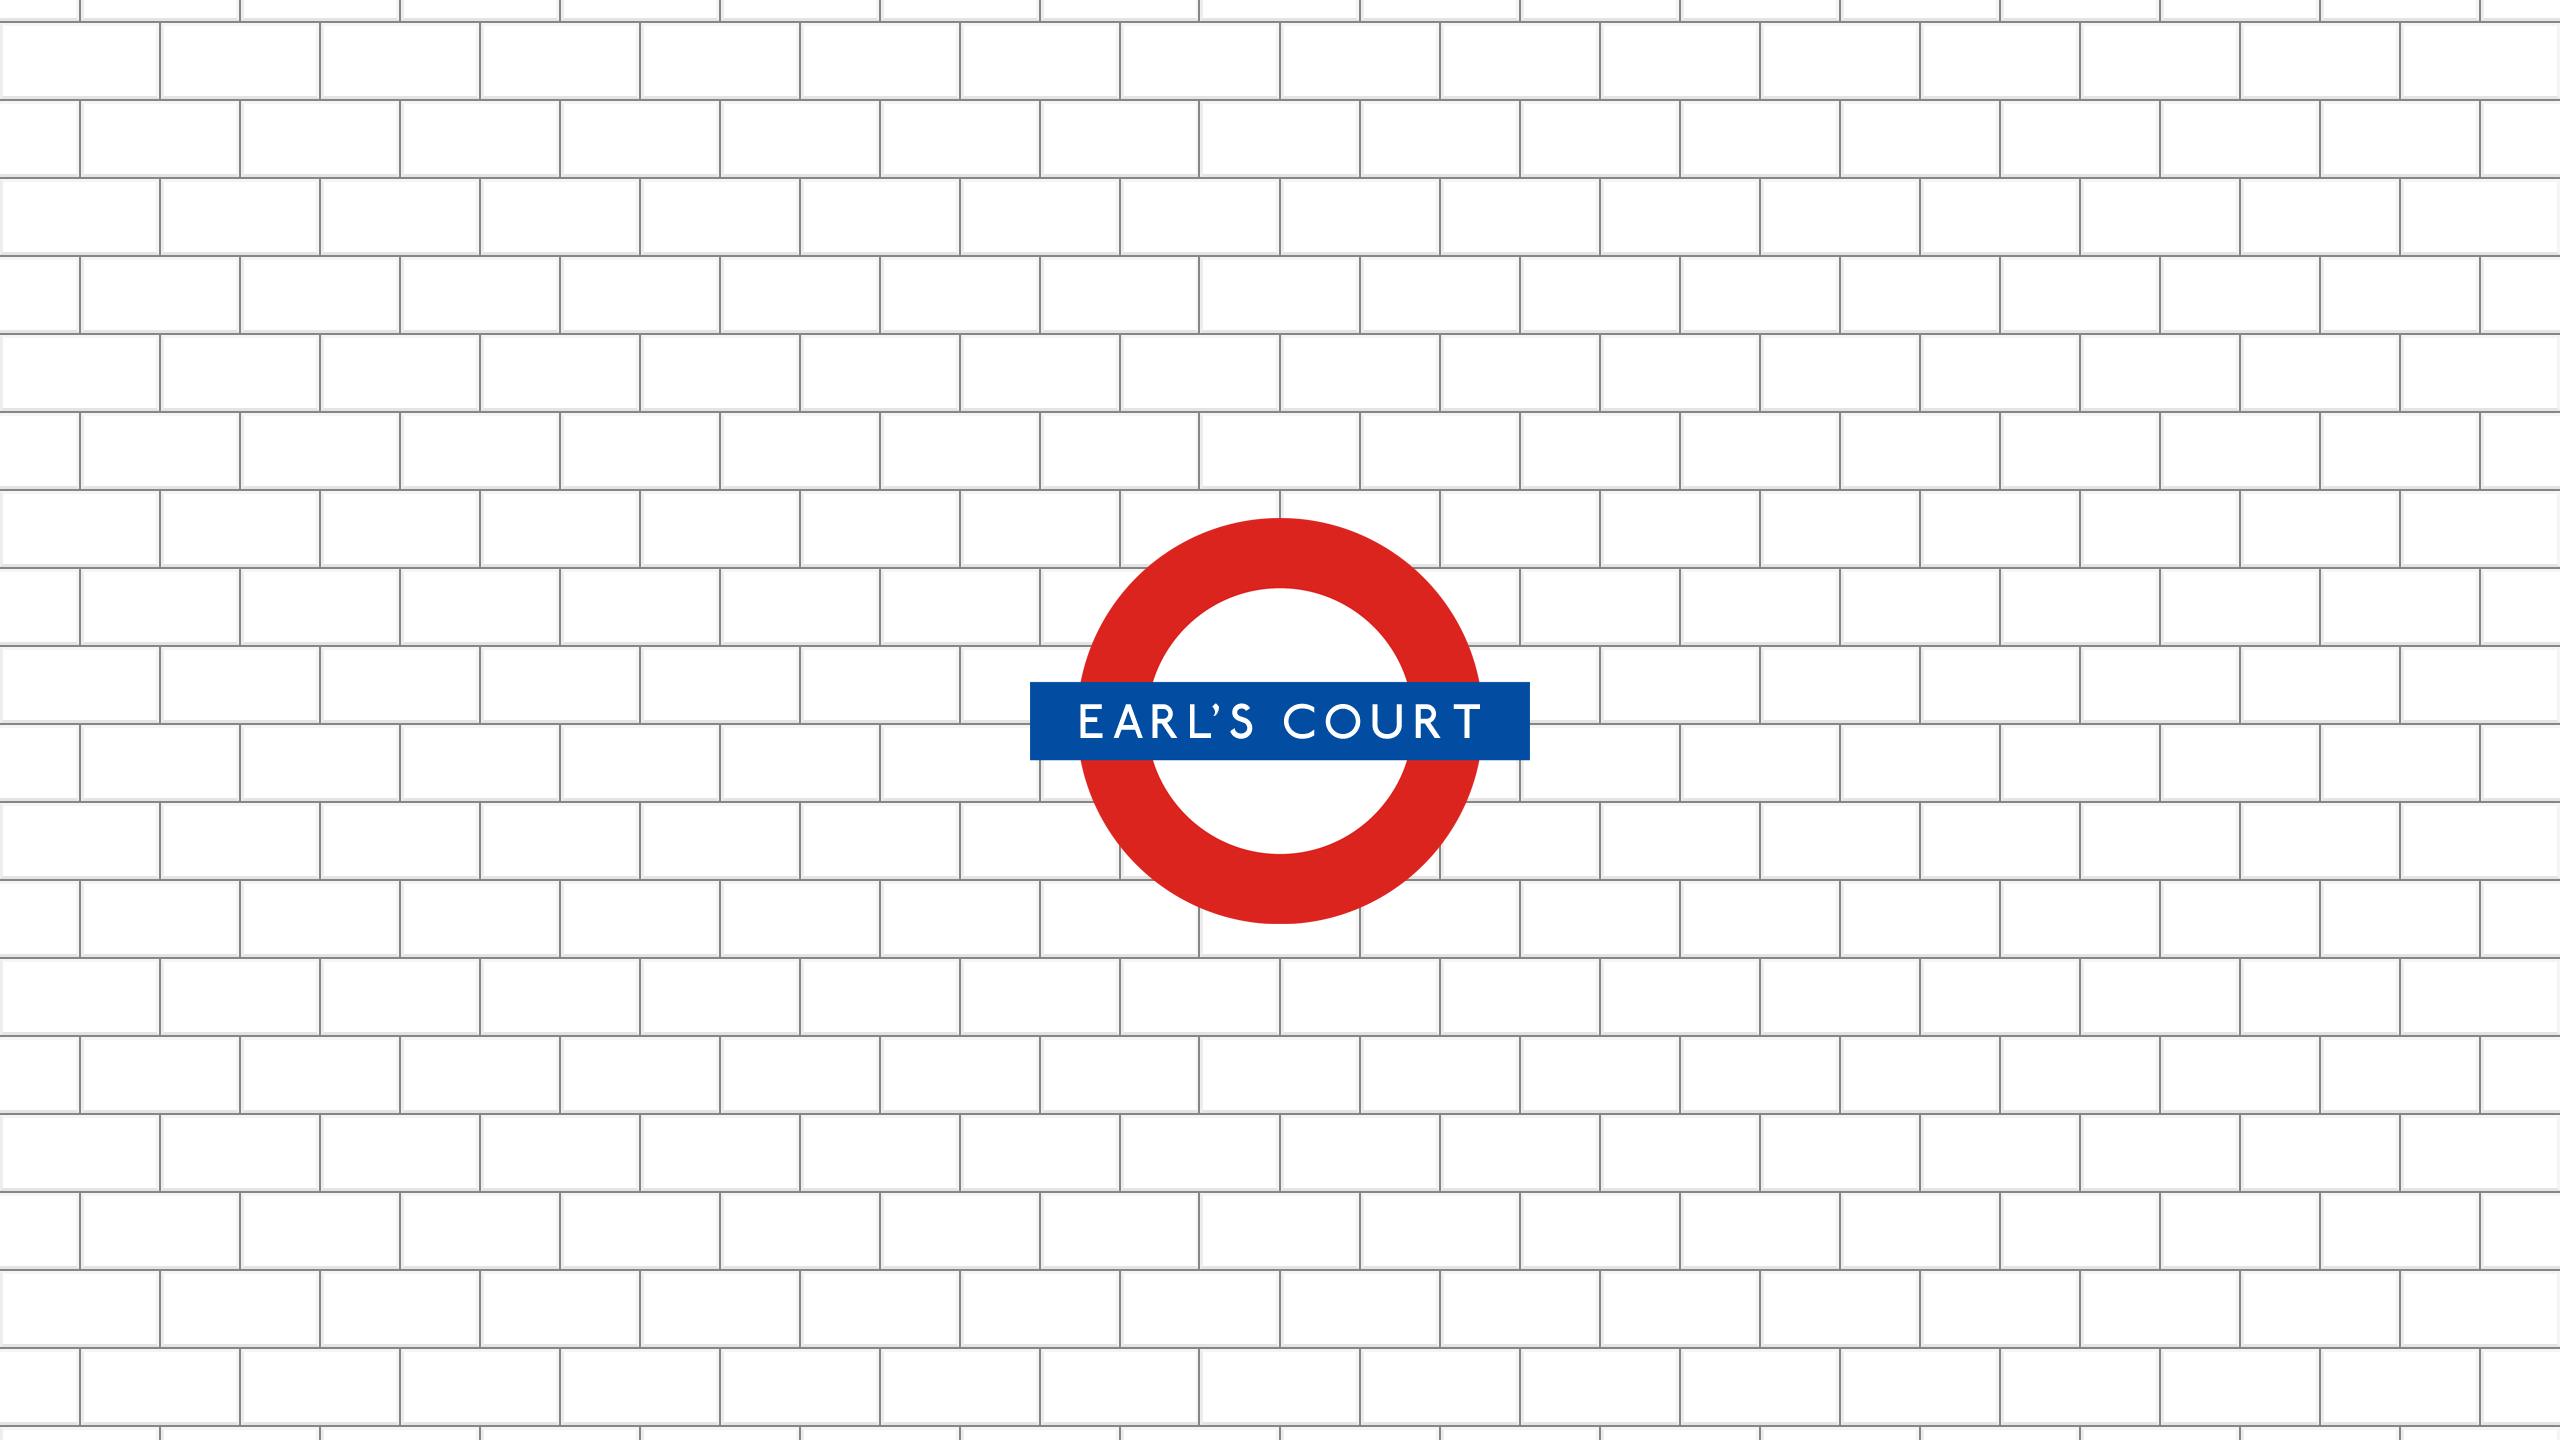 Earl's Court